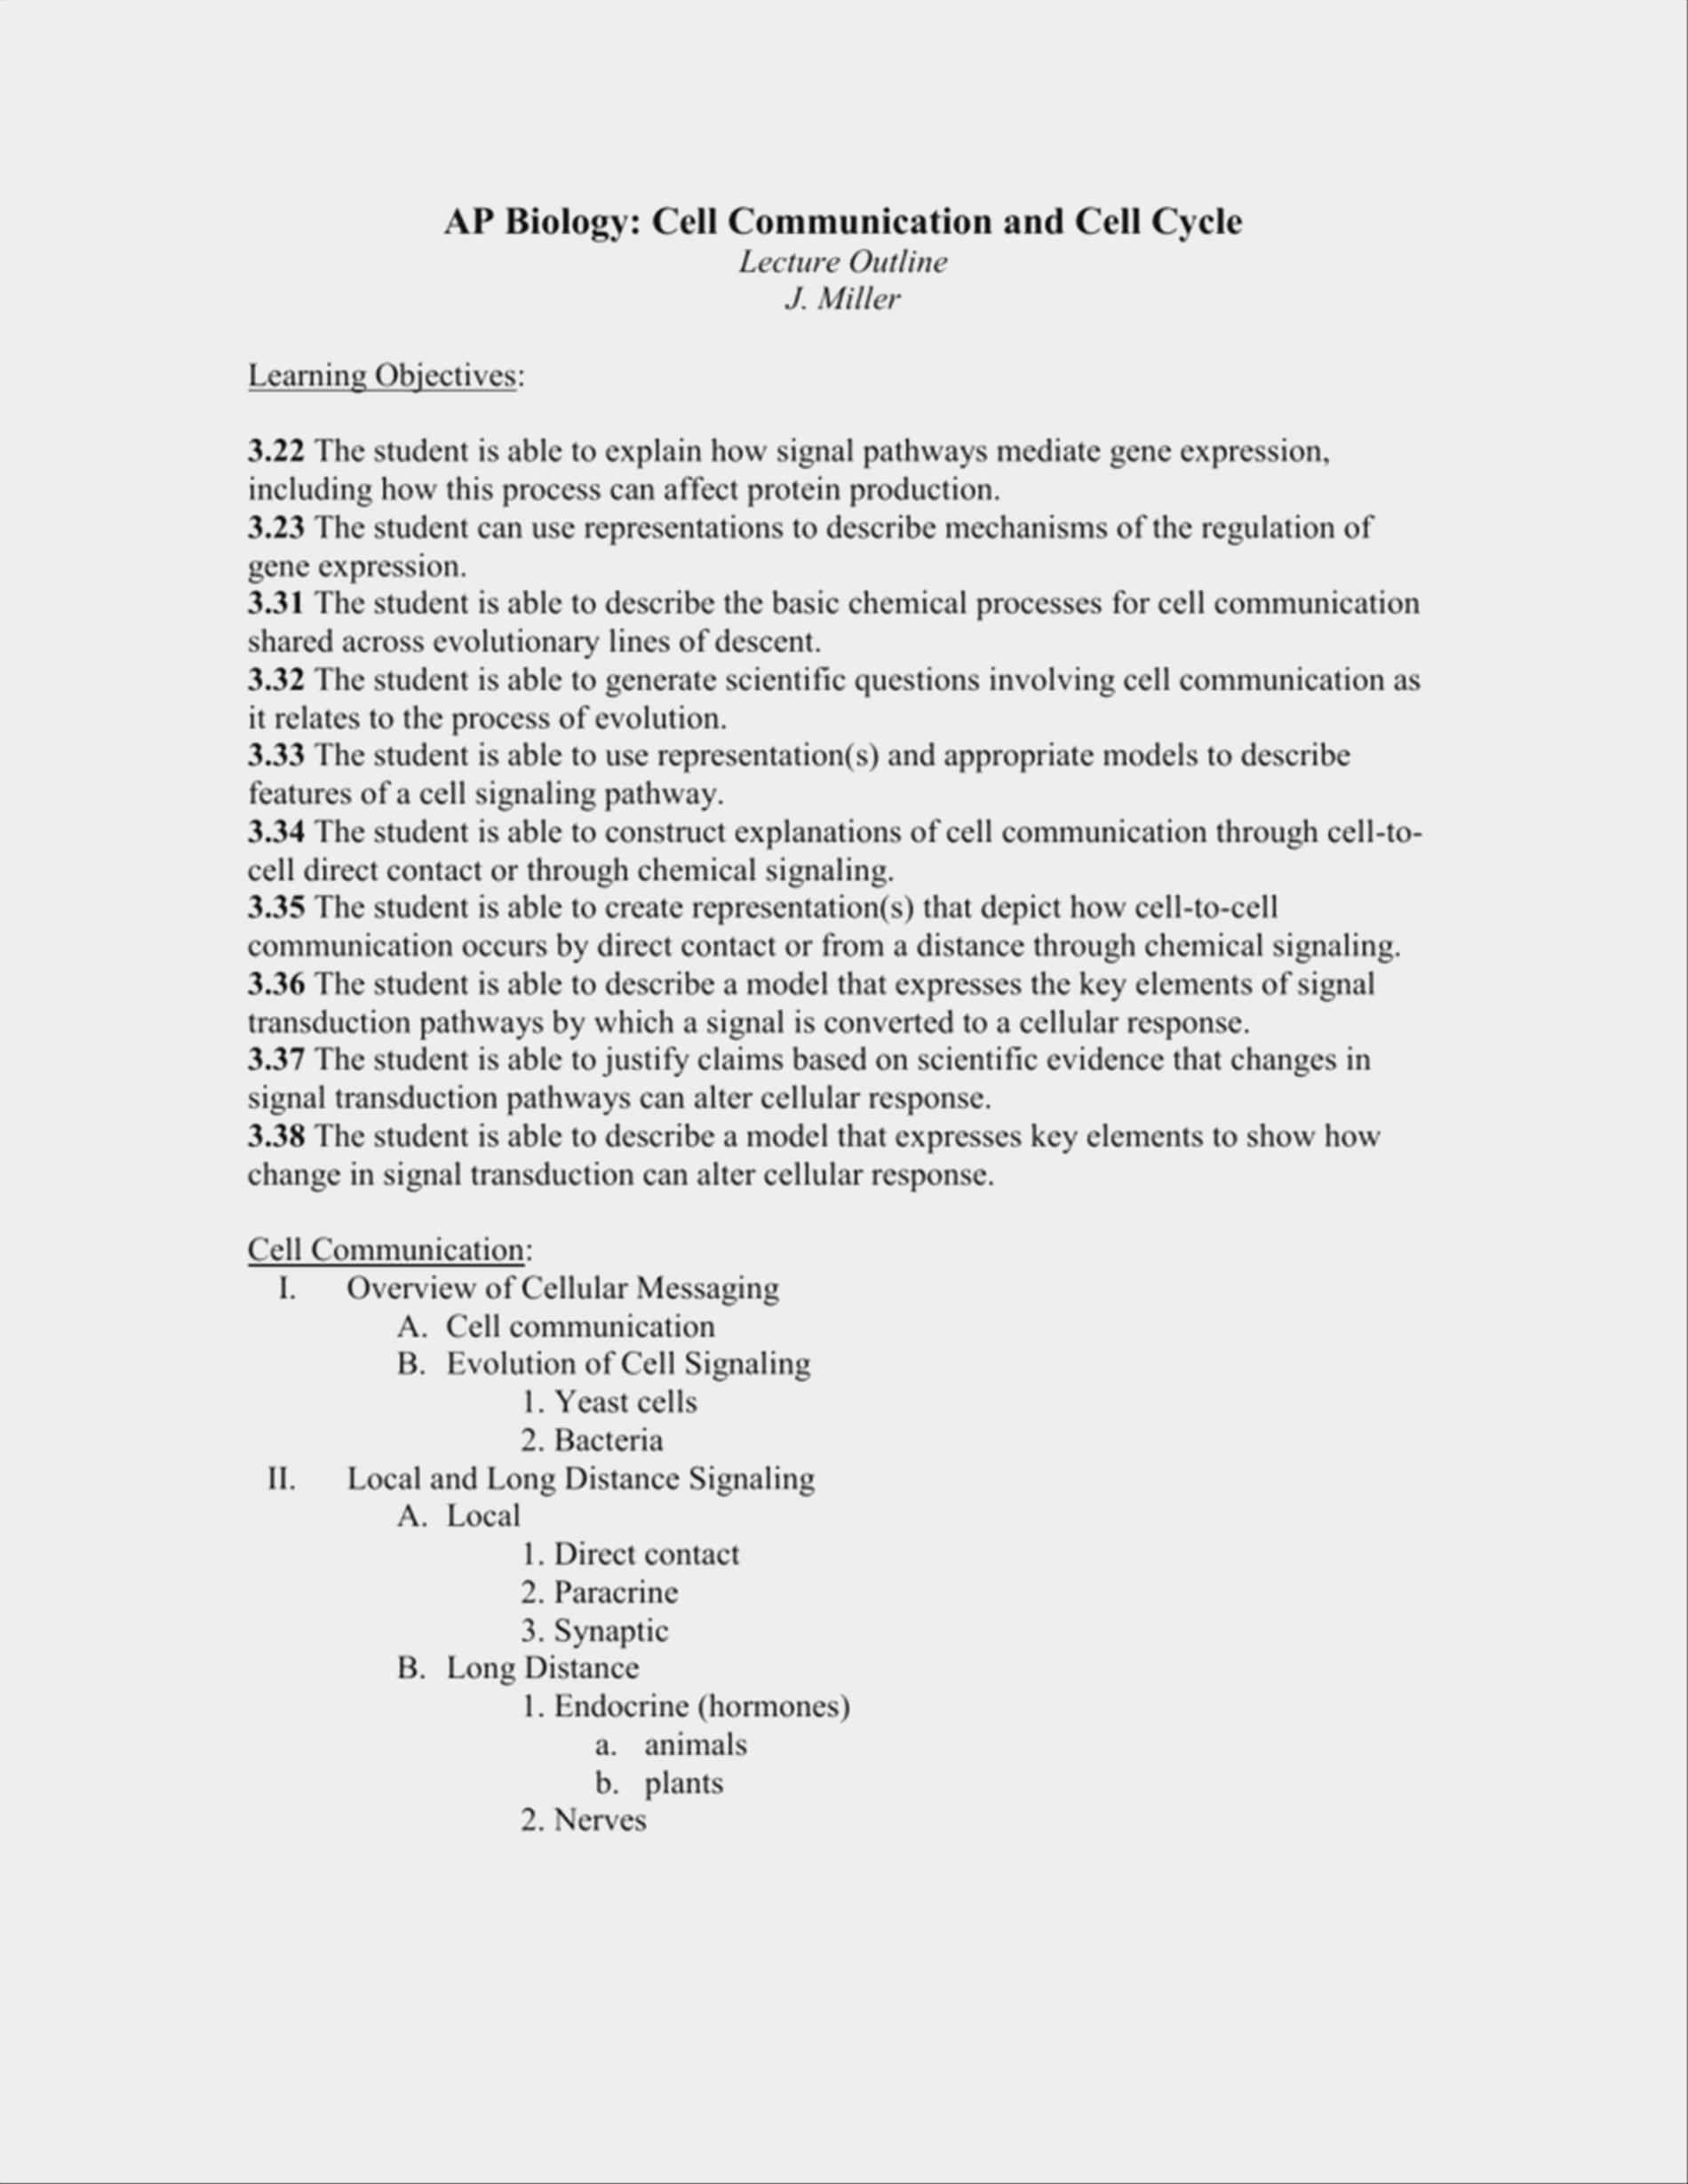 Human Endocrine Hormones Worksheet